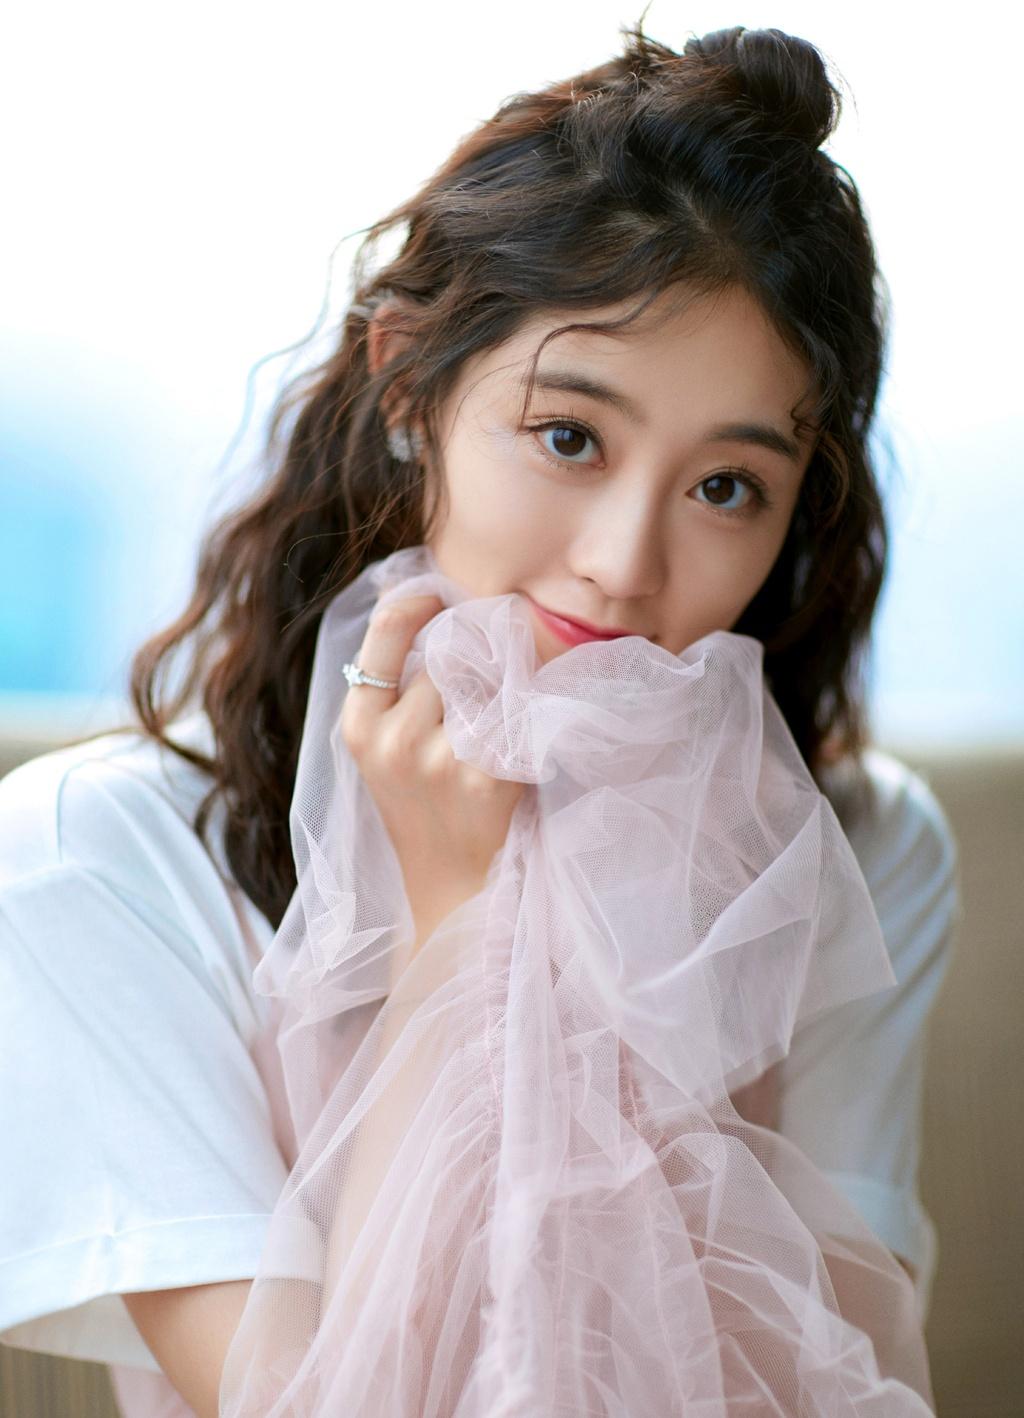 My nhan 9X dong vai nhan vat nu dang so nhat truyen Kim Dung la ai? hinh anh 3